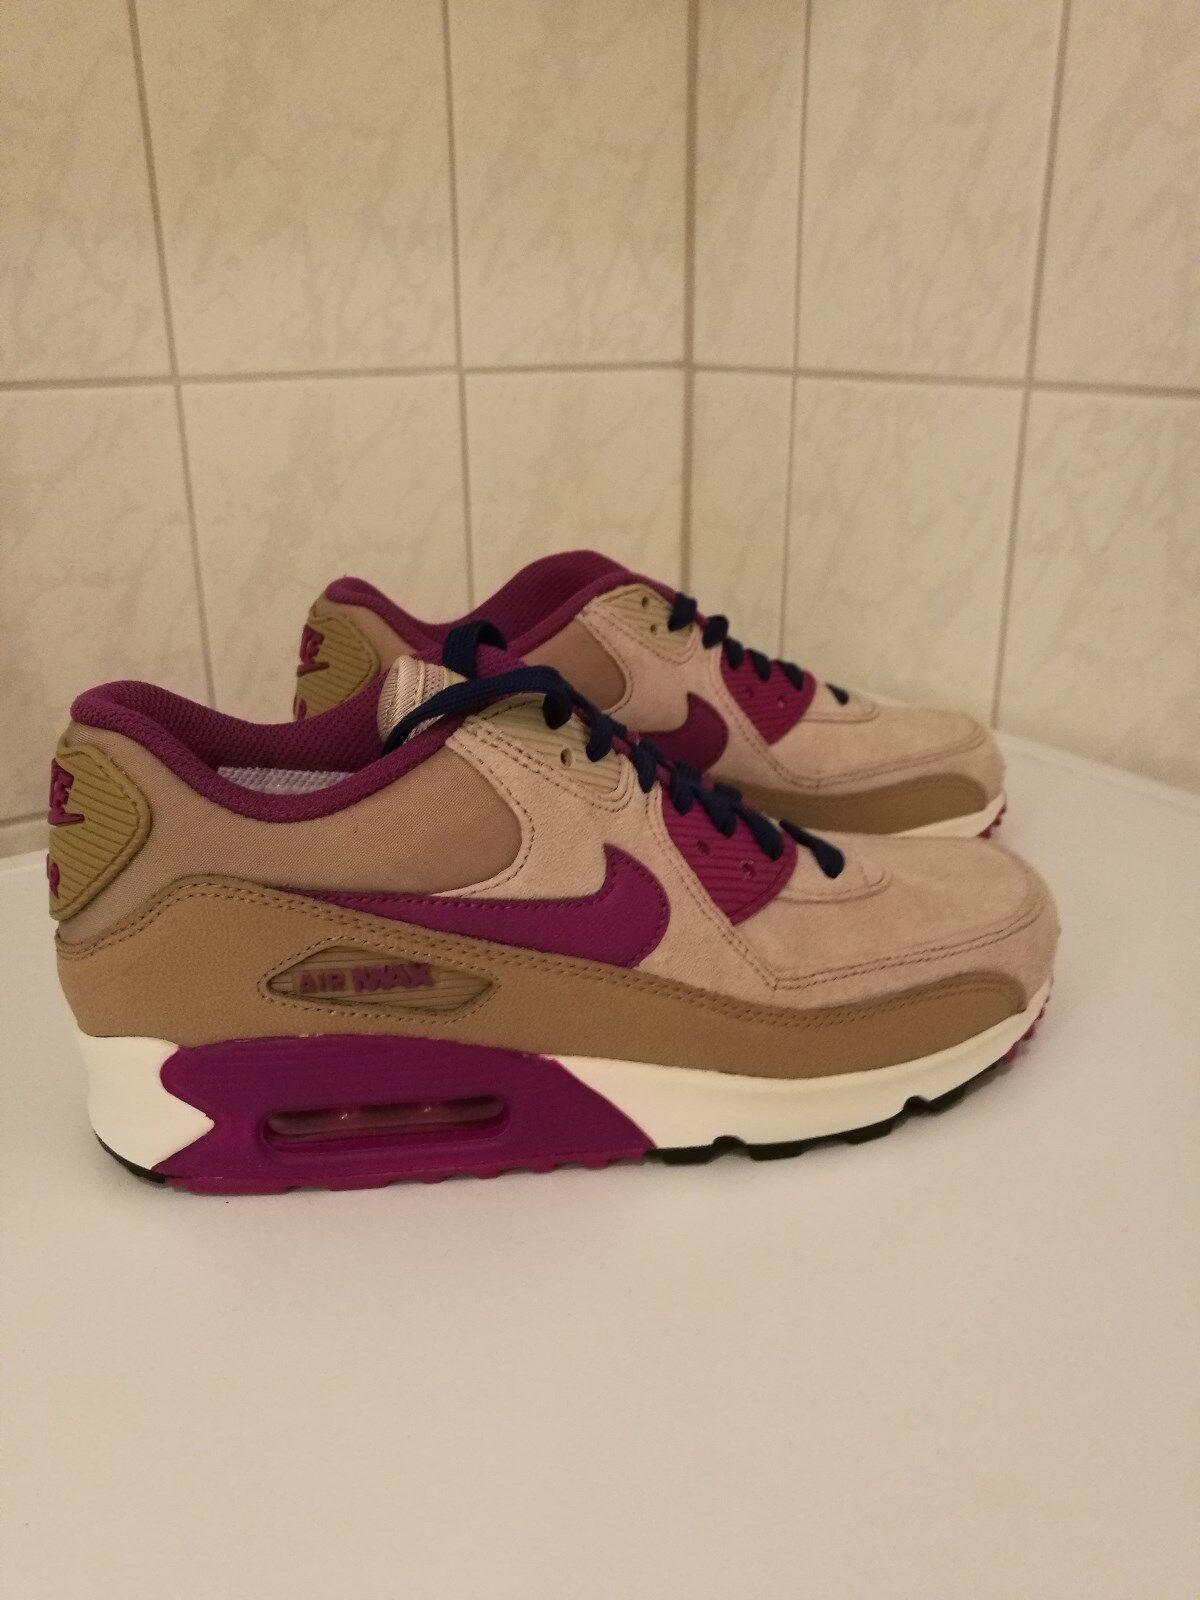 22a1f5a854e68 Nike Nike Nike Zoom Winflo 3 Mens Running Sneakers Orang White Black 831561  800 US Size 10 3ee404